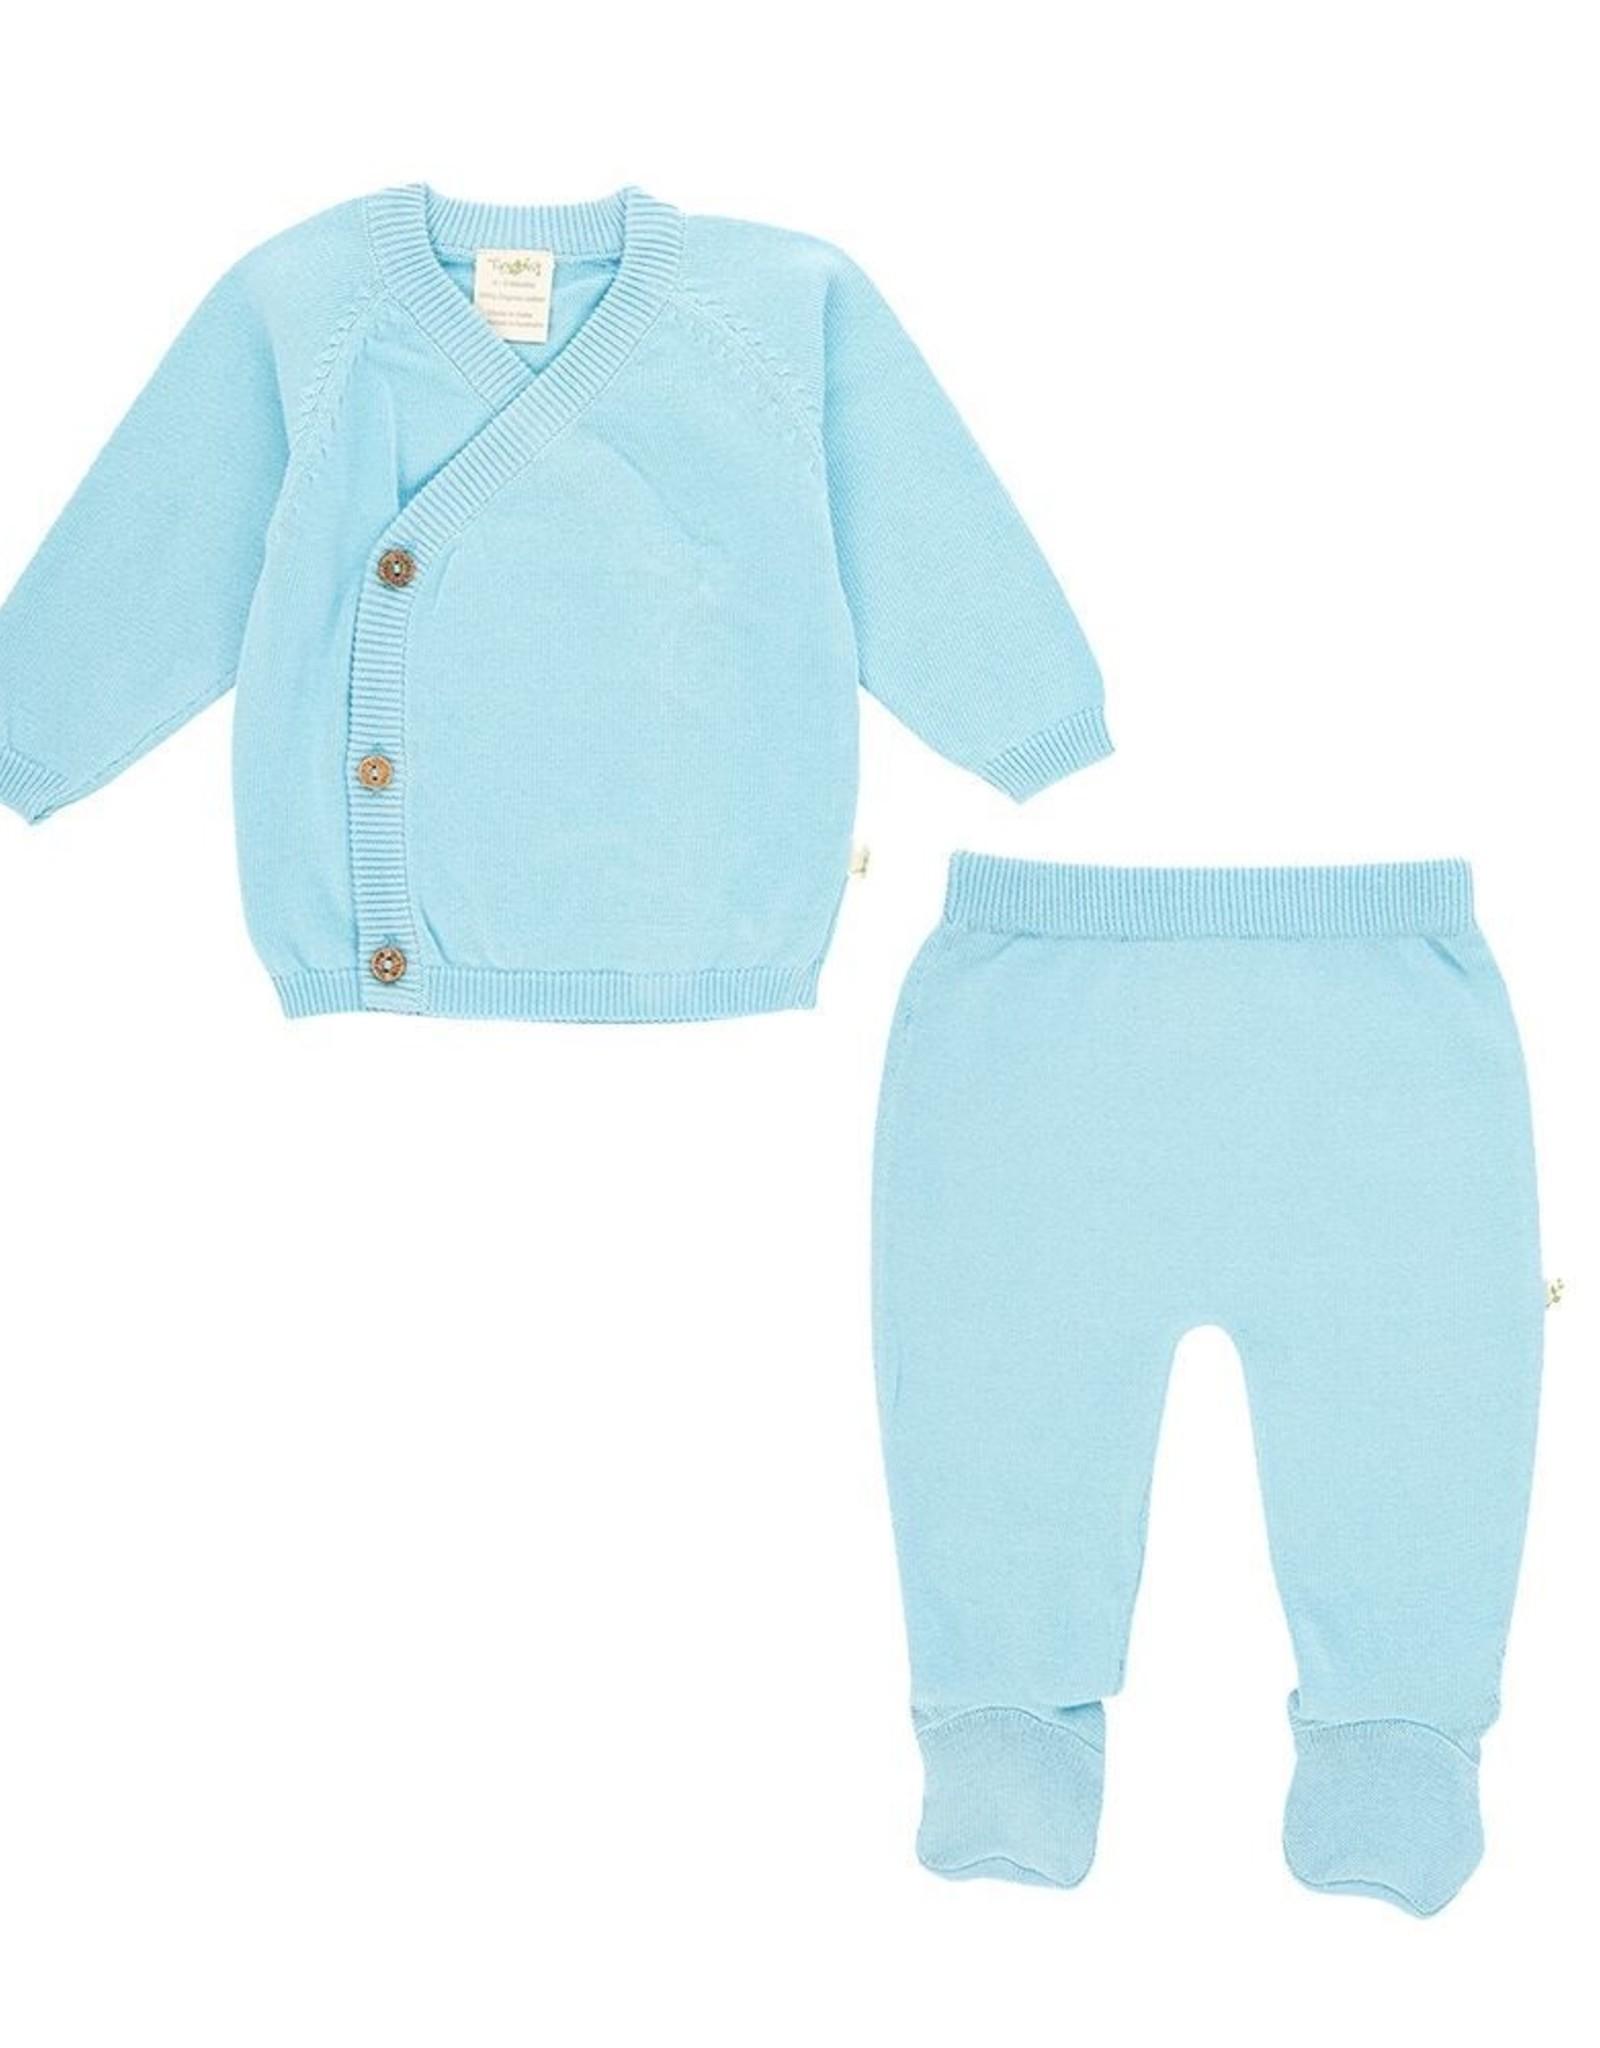 Tiny Twig Kimono 2pc Set- Blue Newborn